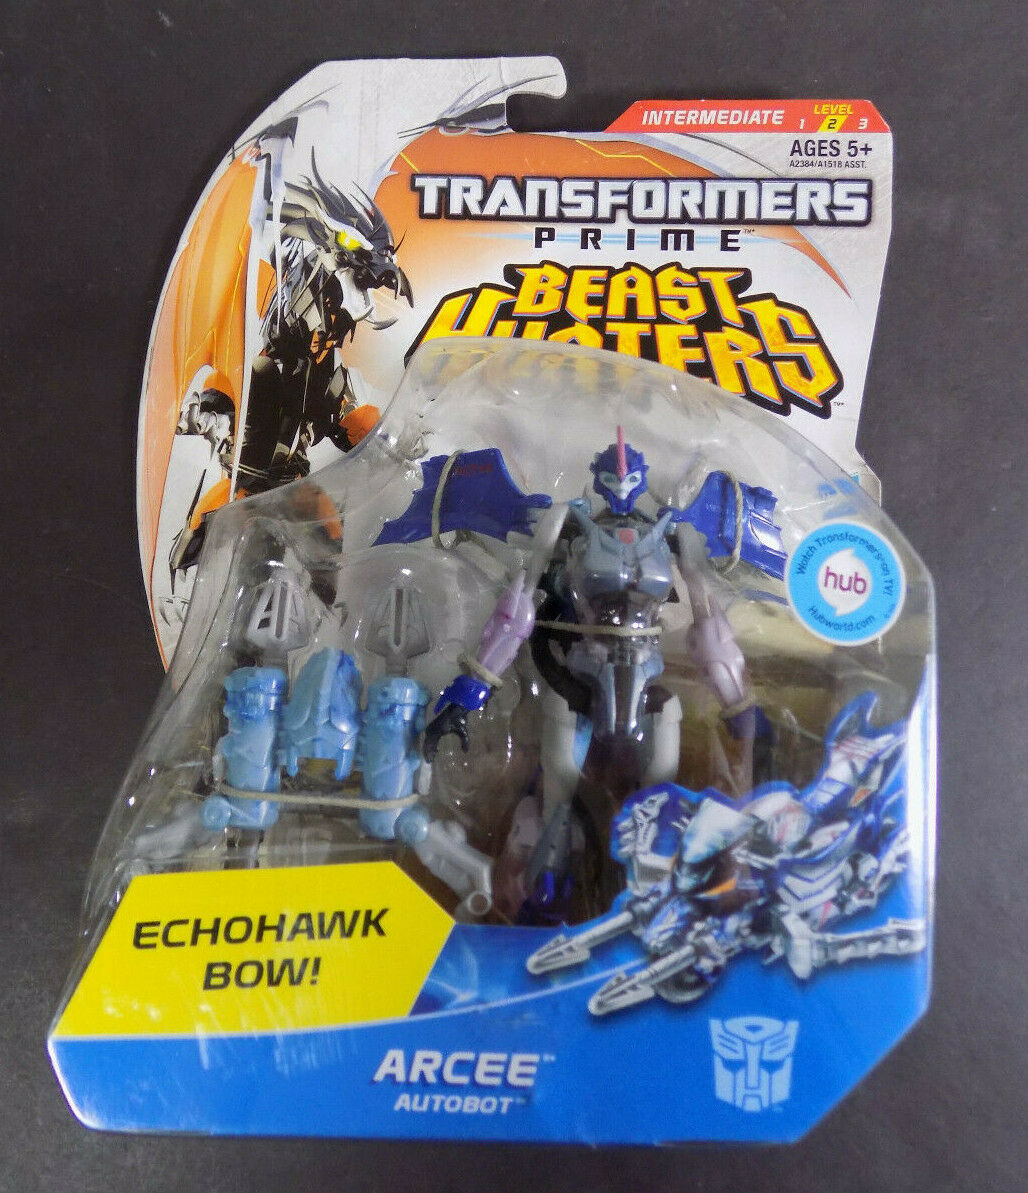 Transformers Prime Beast Hunters VERTEBREAK Deluxe Class Loose 100/% Complete